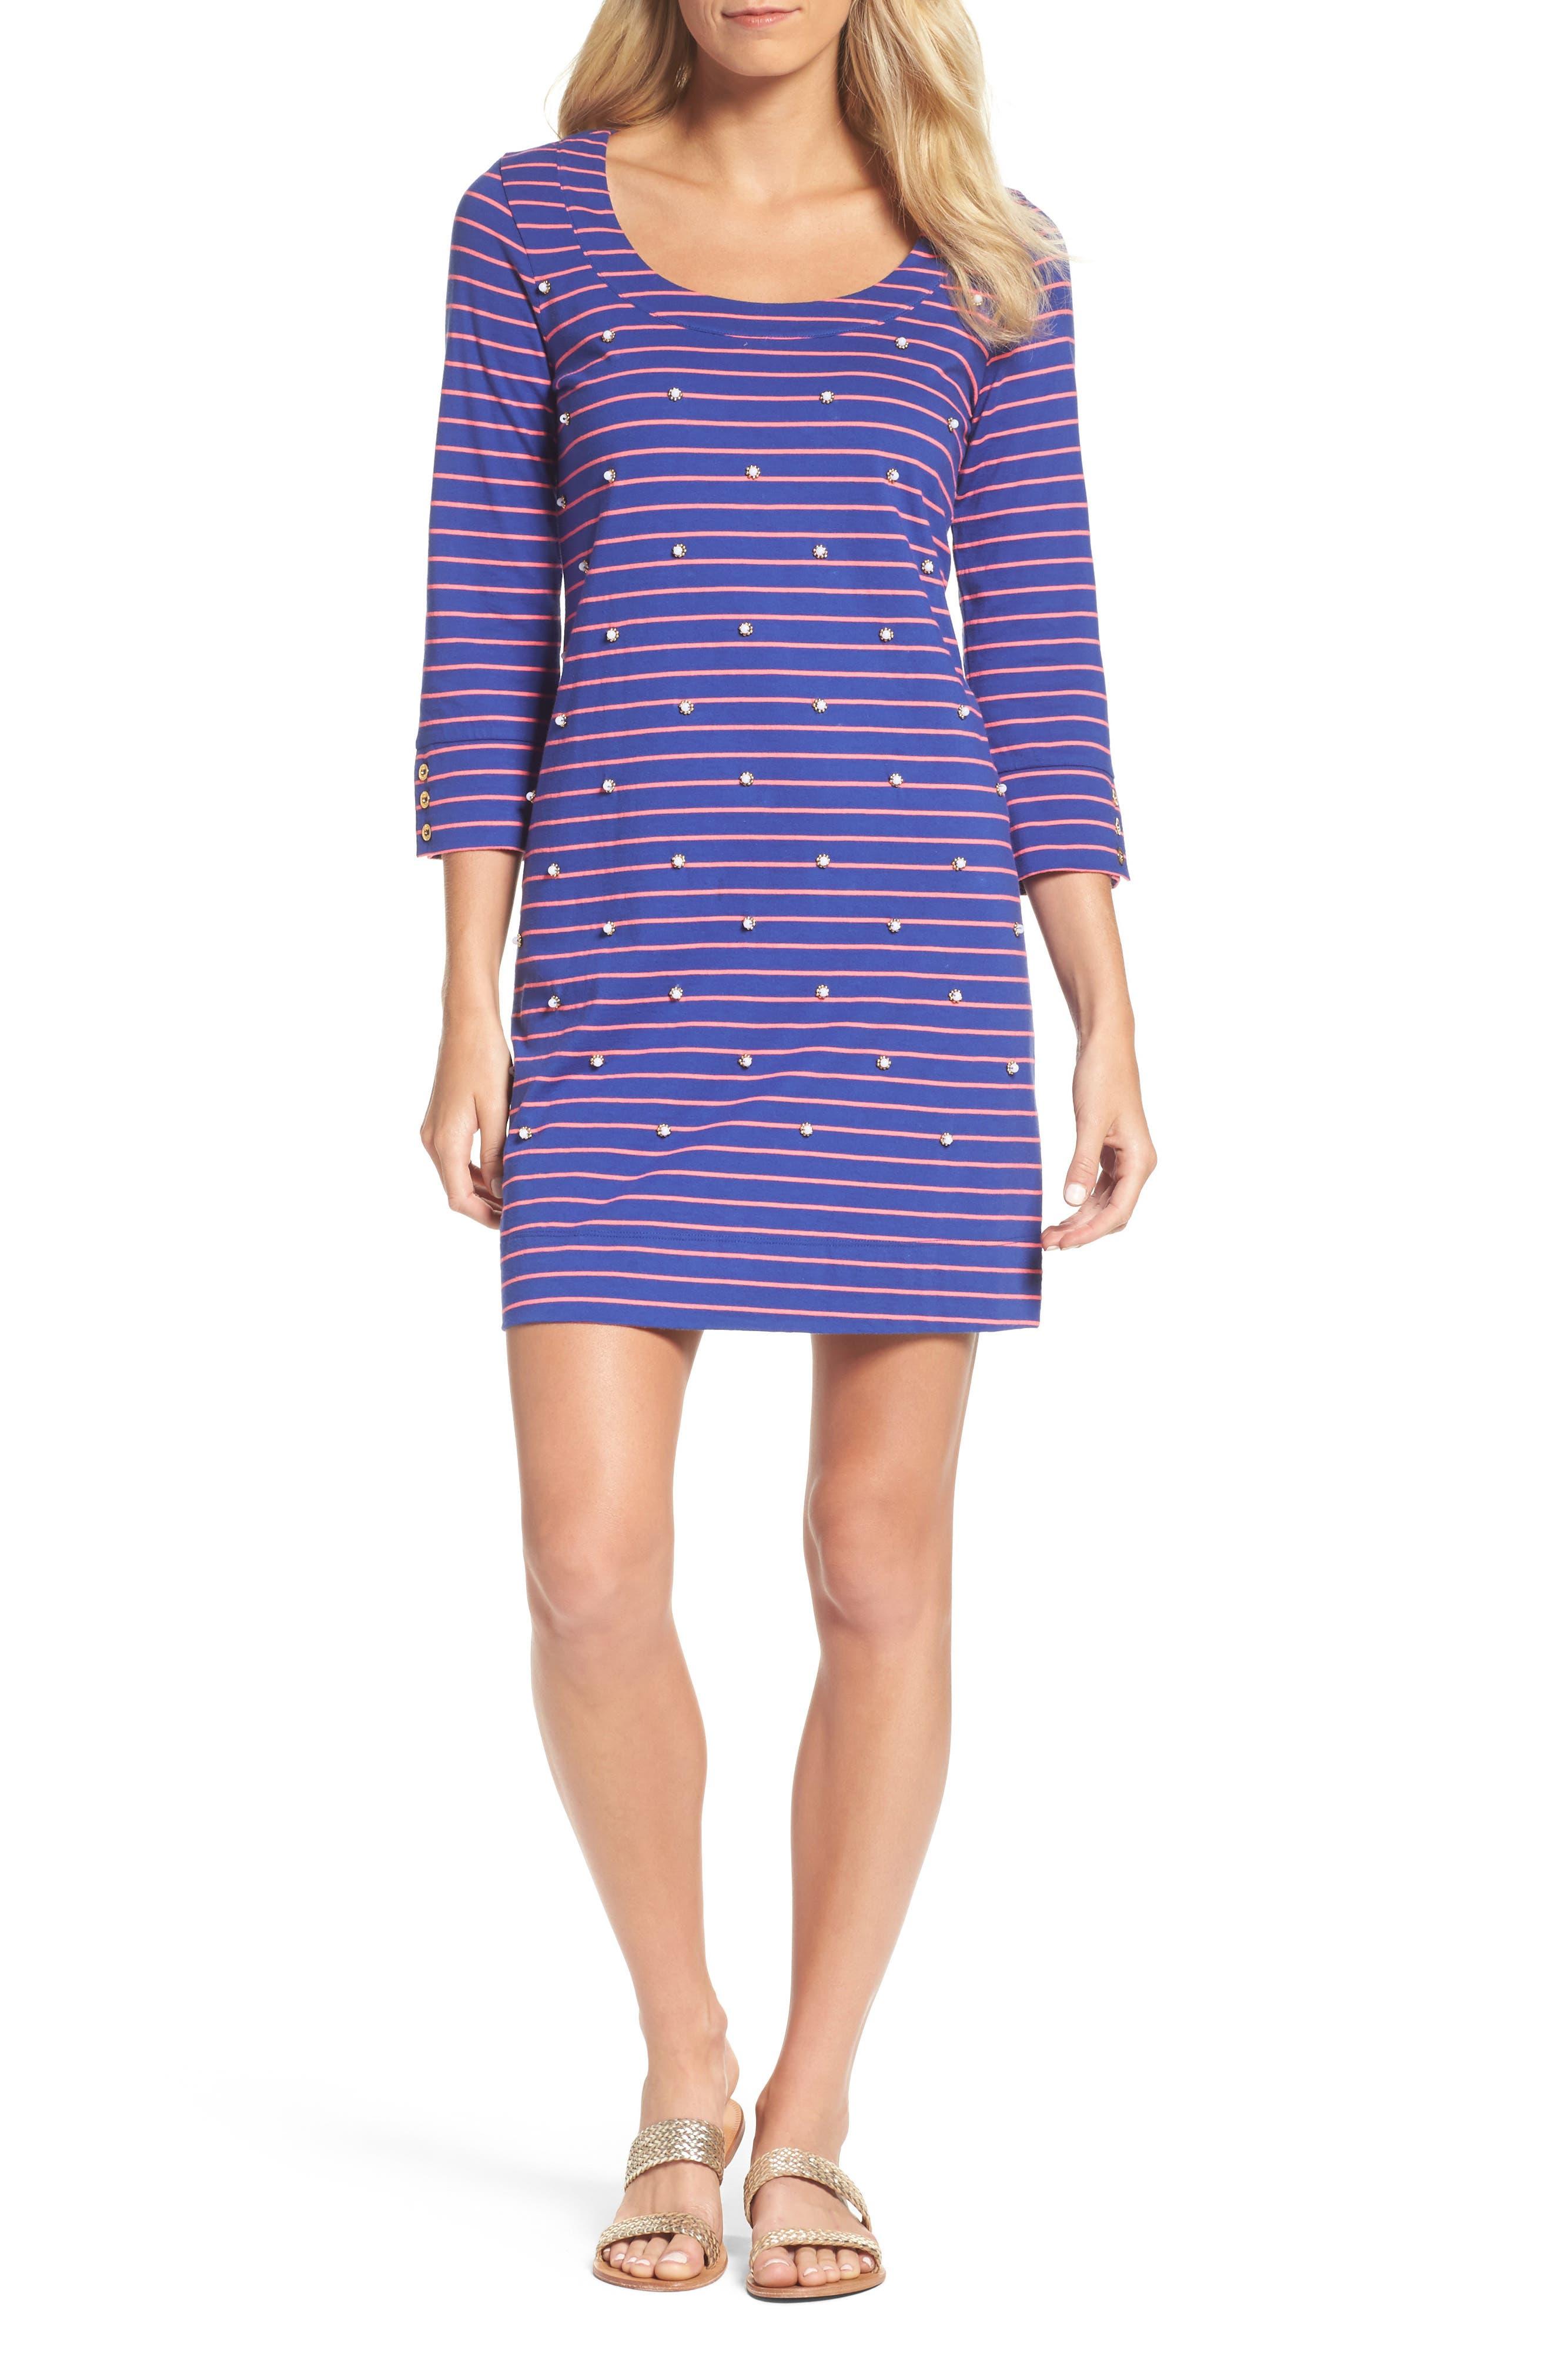 Main Image - Lilly Pulitzer® Merrit Beaded T-Shirt Dress